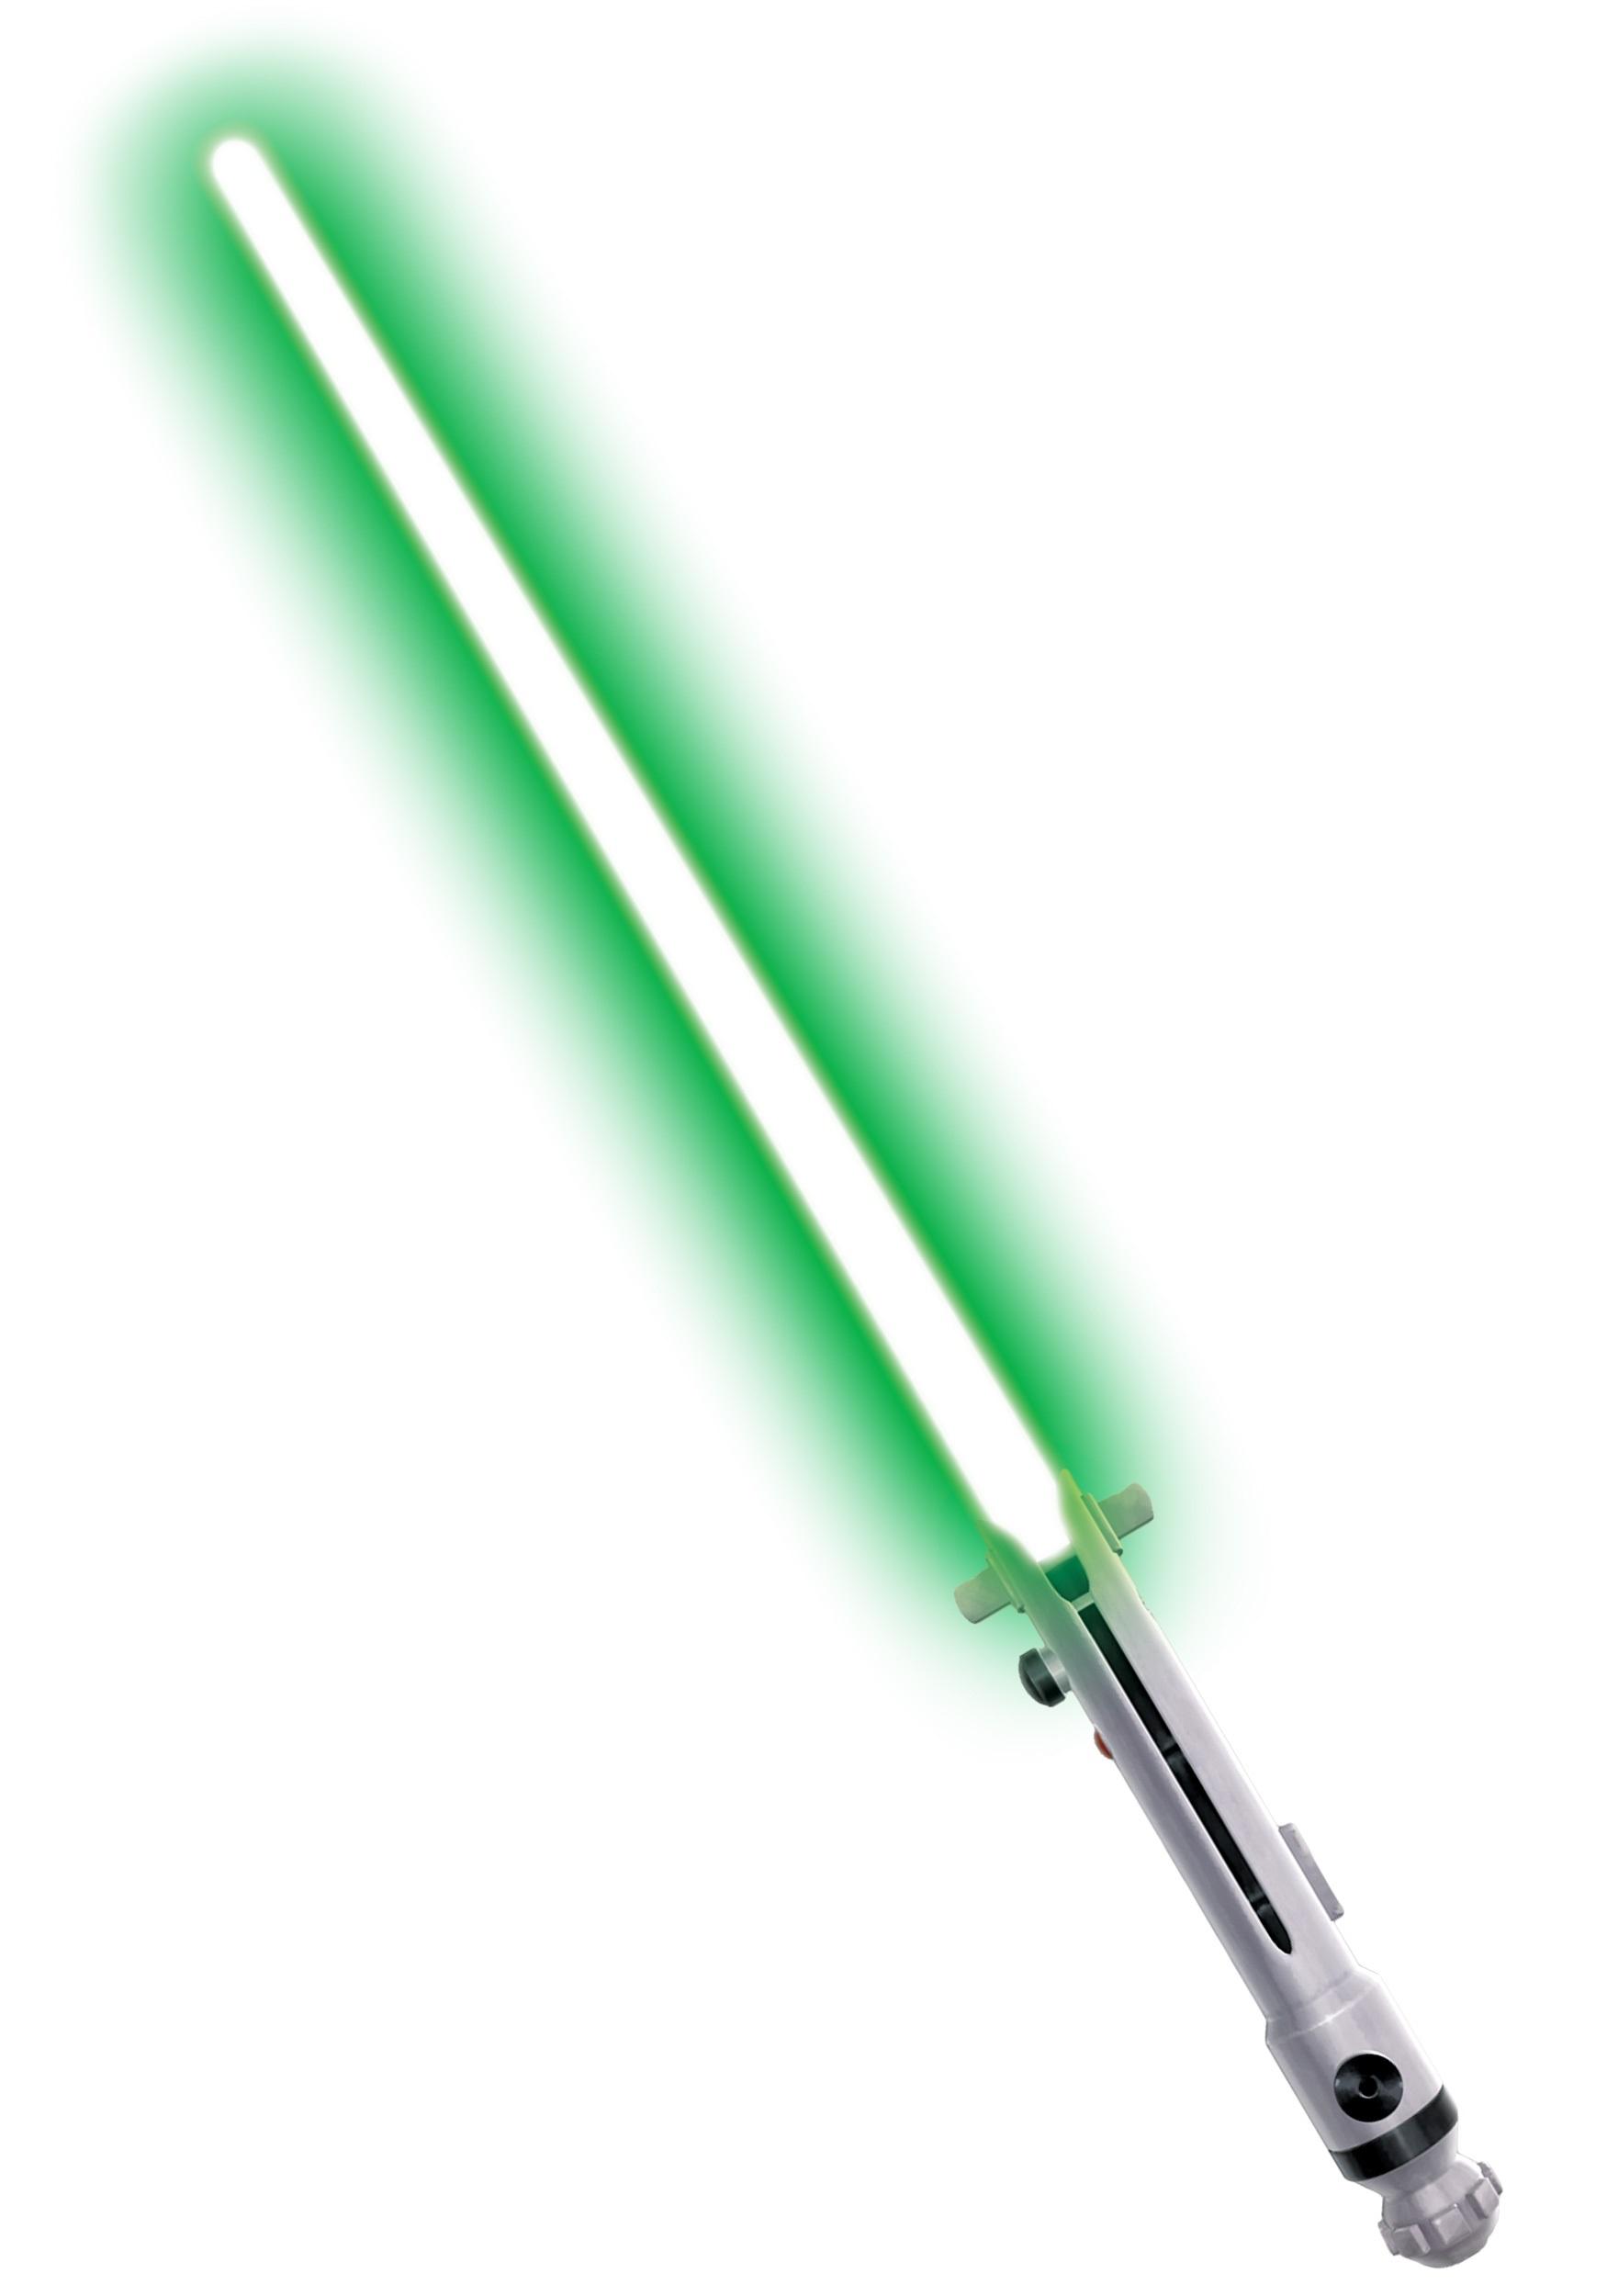 New homemade lightsaber hilt clipart.